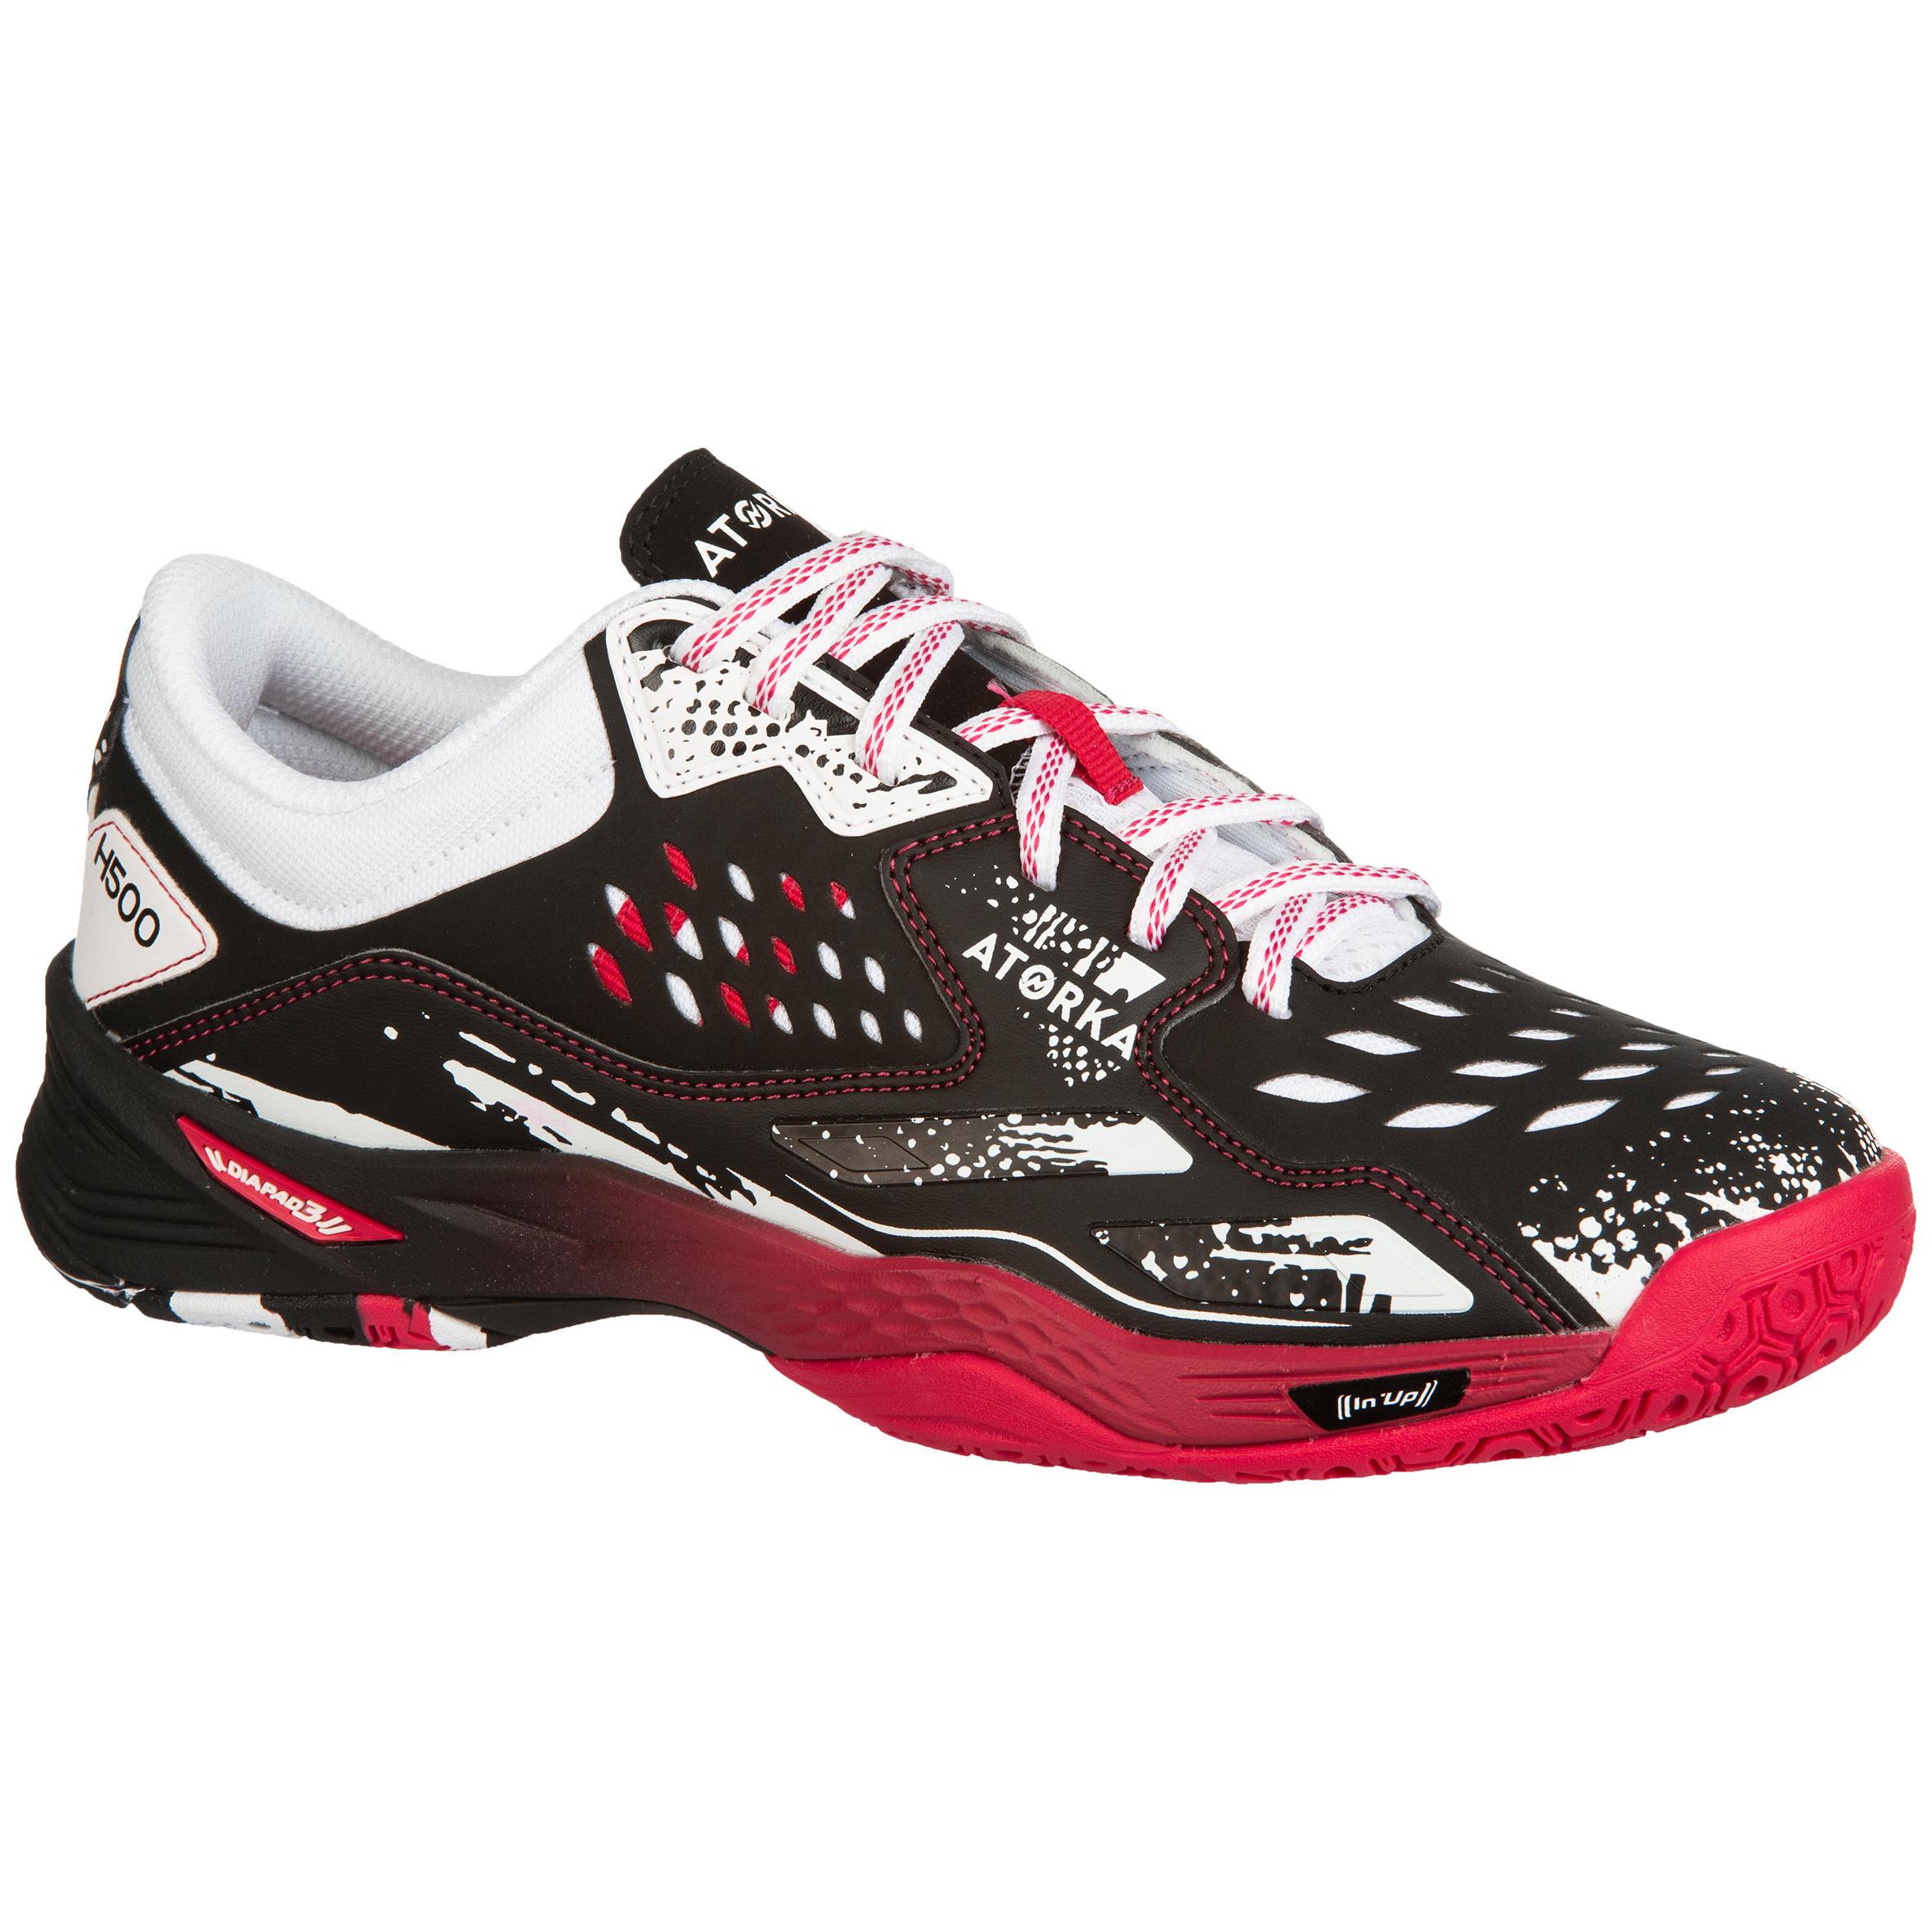 Handballschuhe H500 rosa/schwarz/weiß | Schuhe > Sportschuhe > Handballschuhe | Atorka